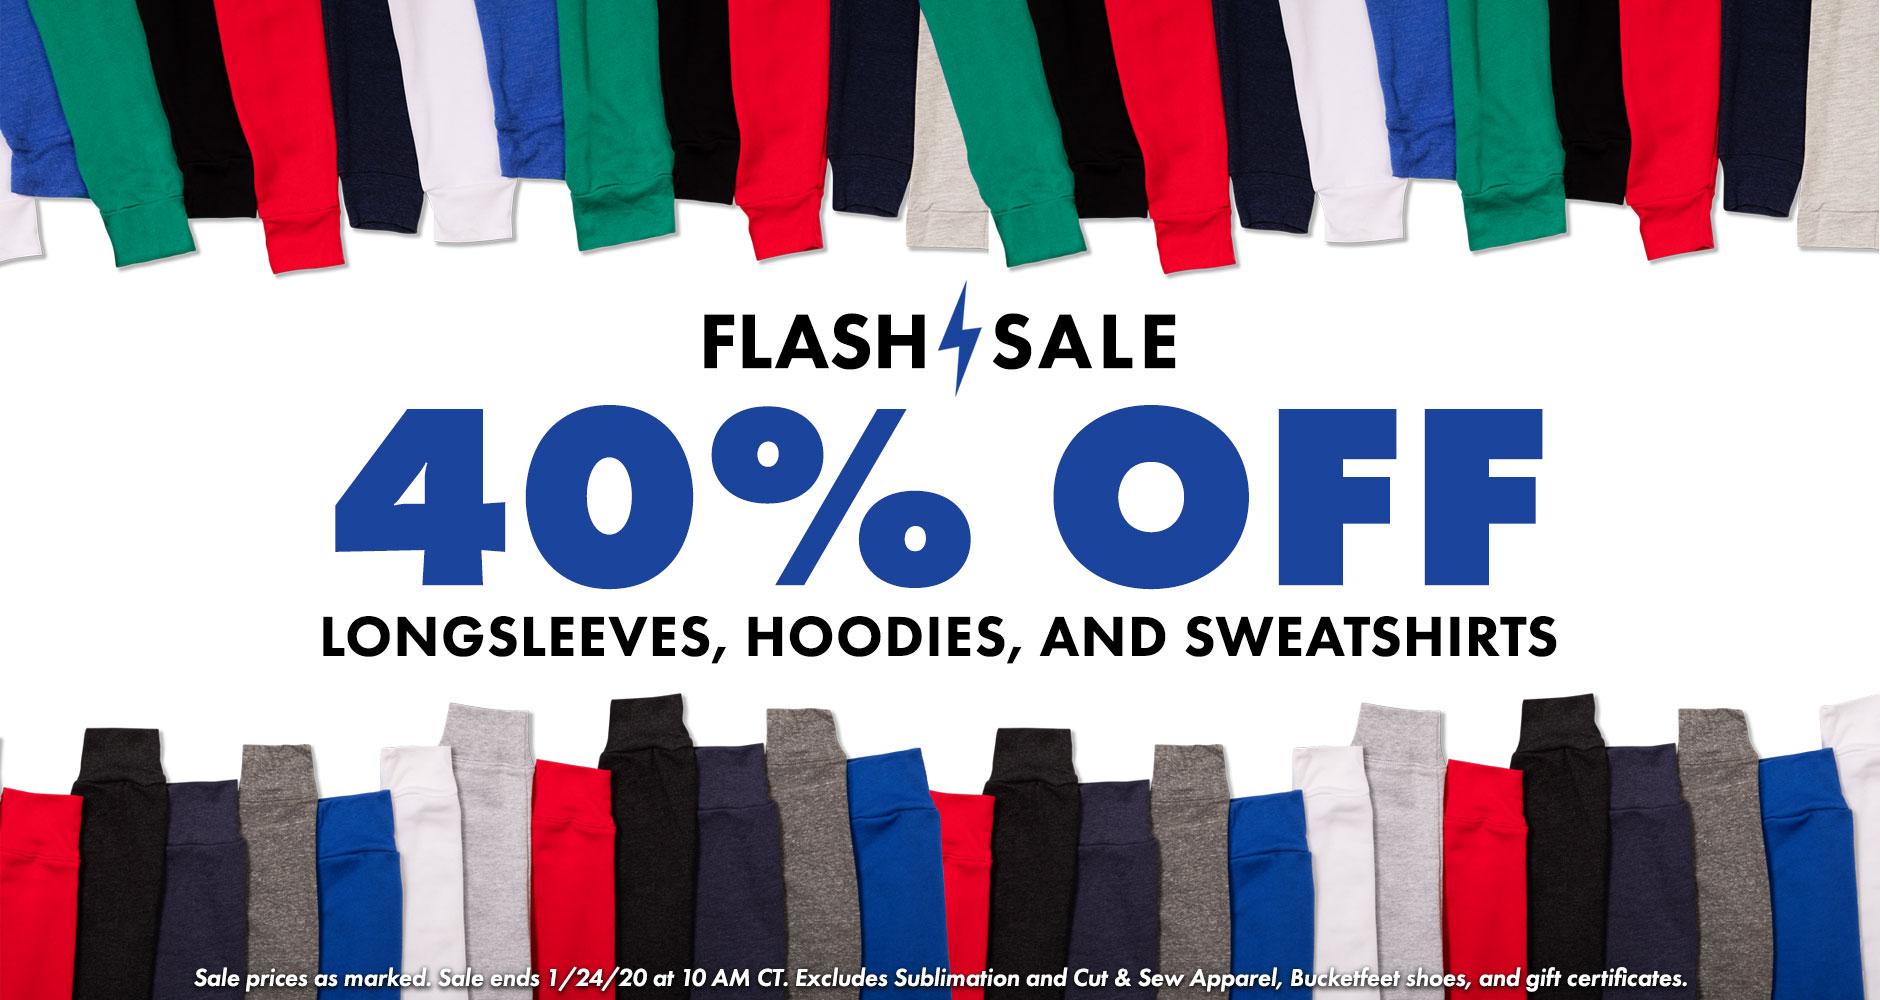 Shop the Threadless Flash Sale 40% off Hoodies, Sweatshirts and Long Sleeves